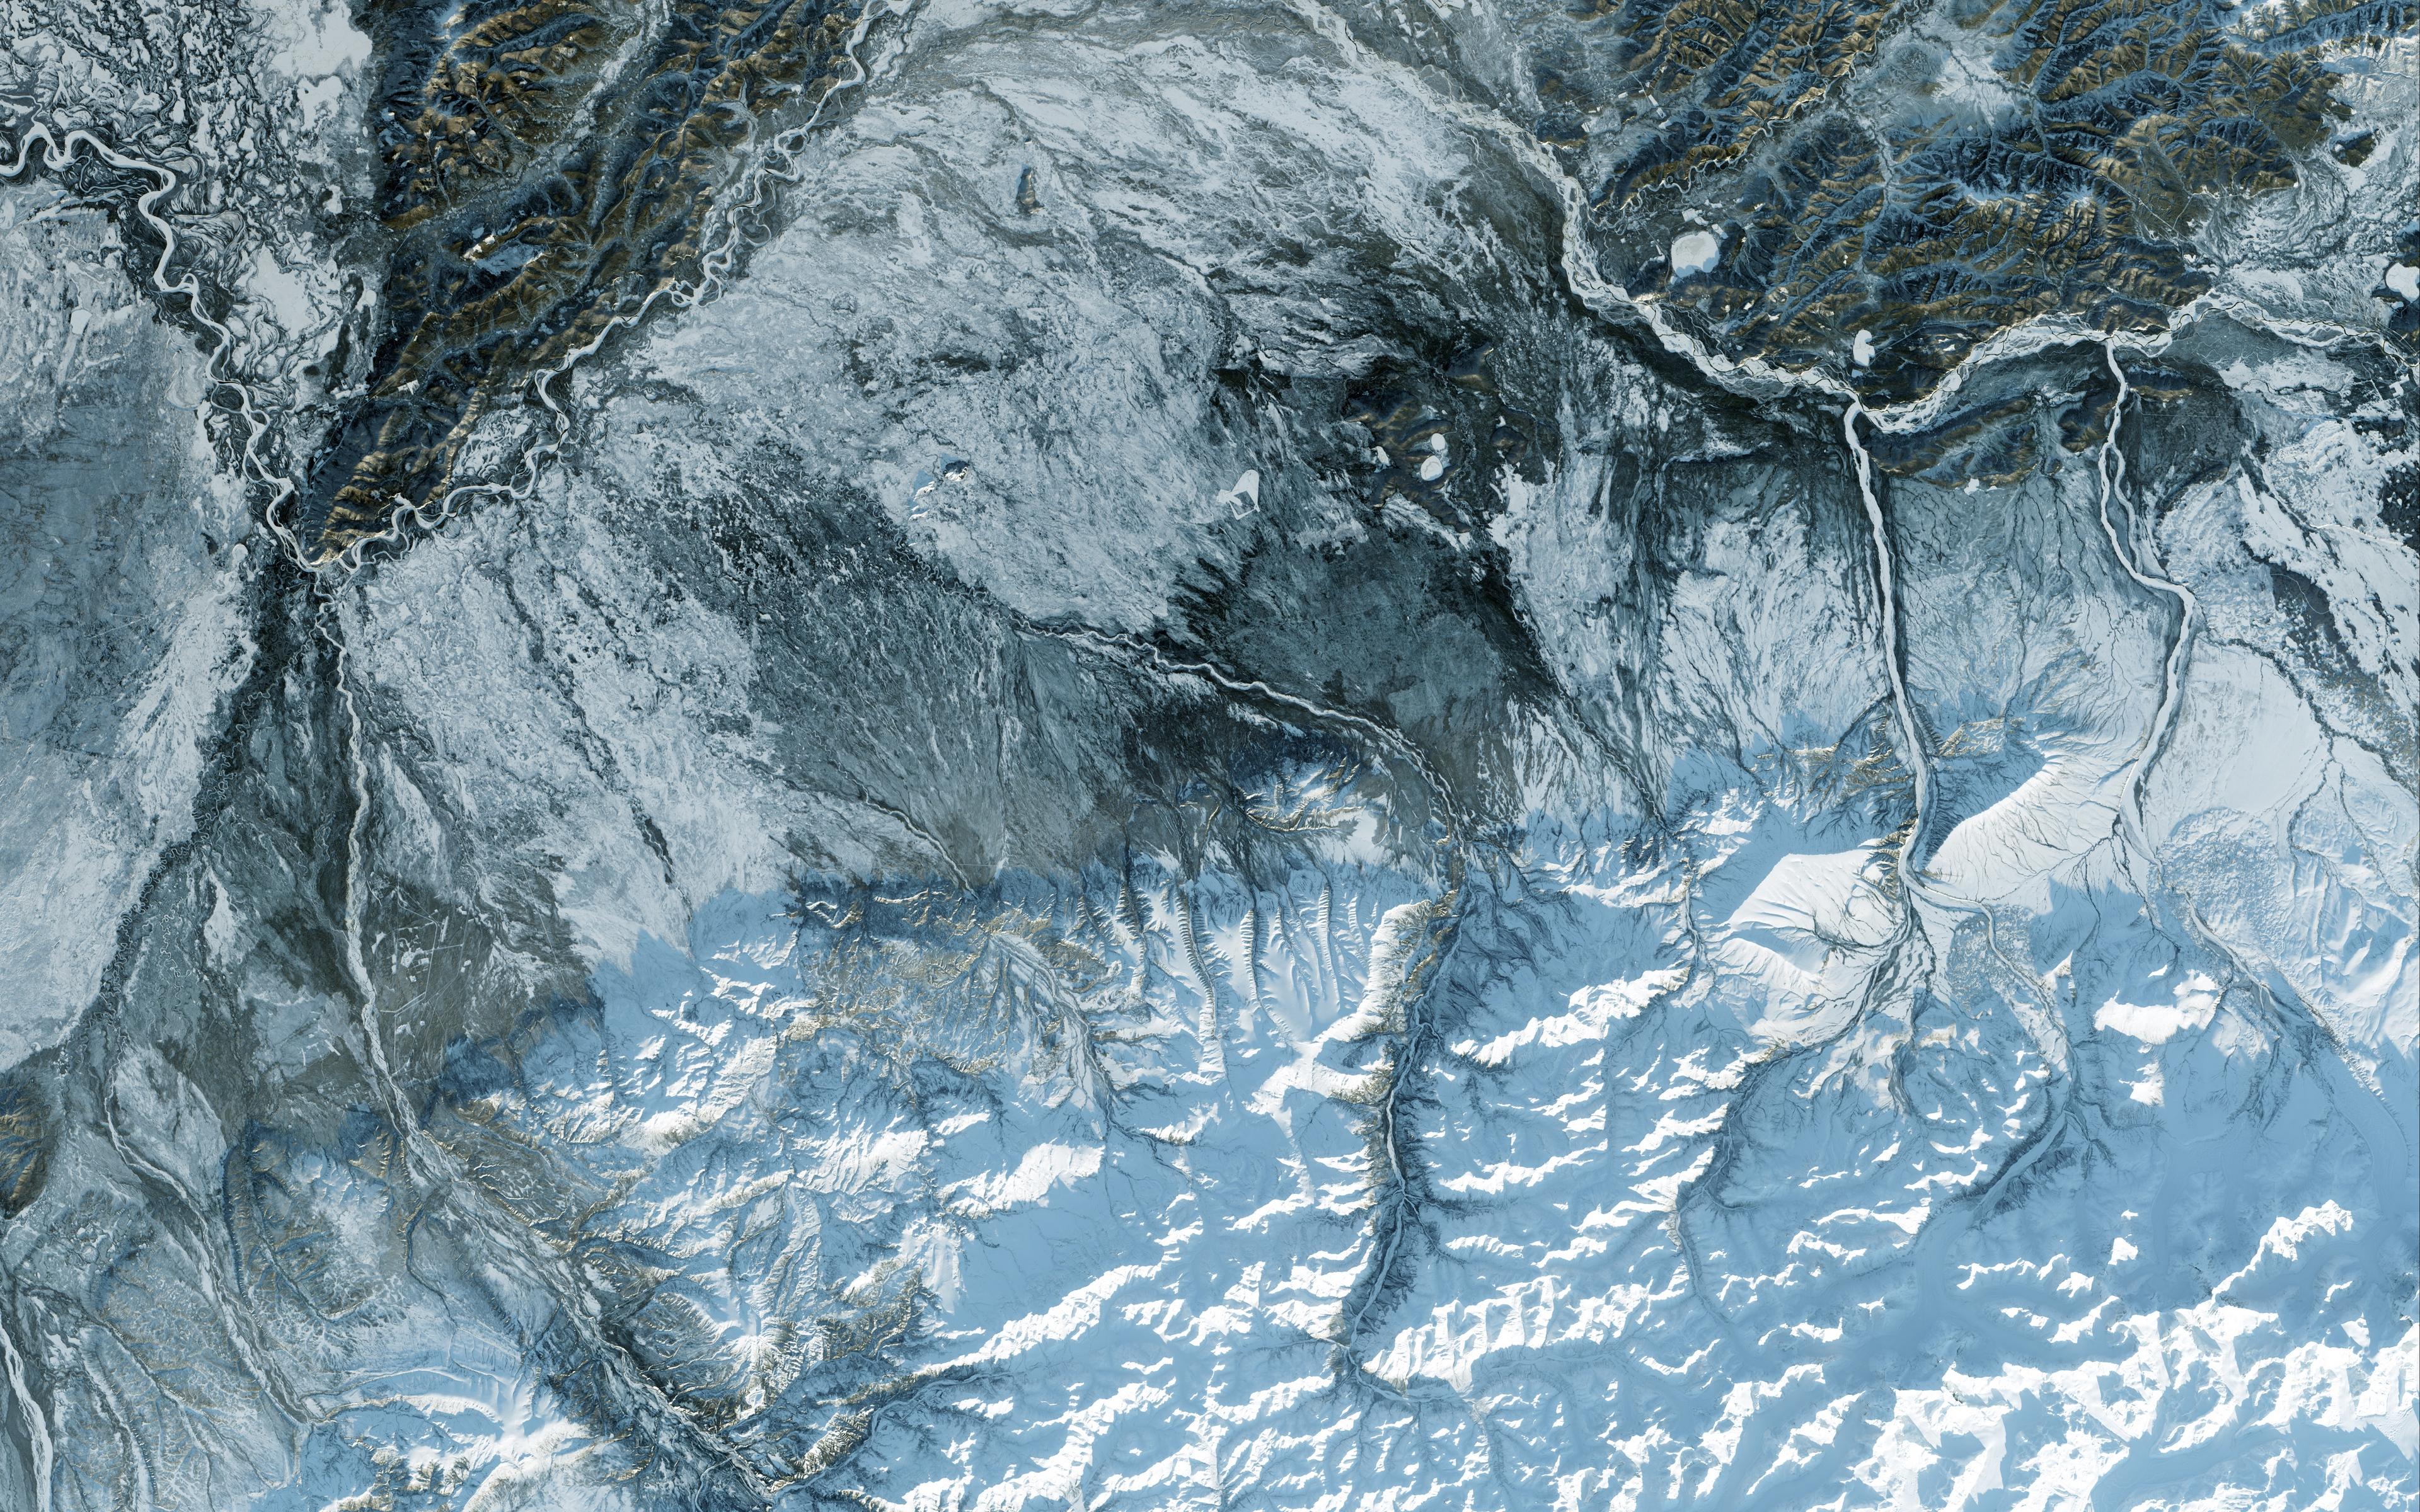 Fondos de pantalla Textura de vista aera del hielo de un glaciar